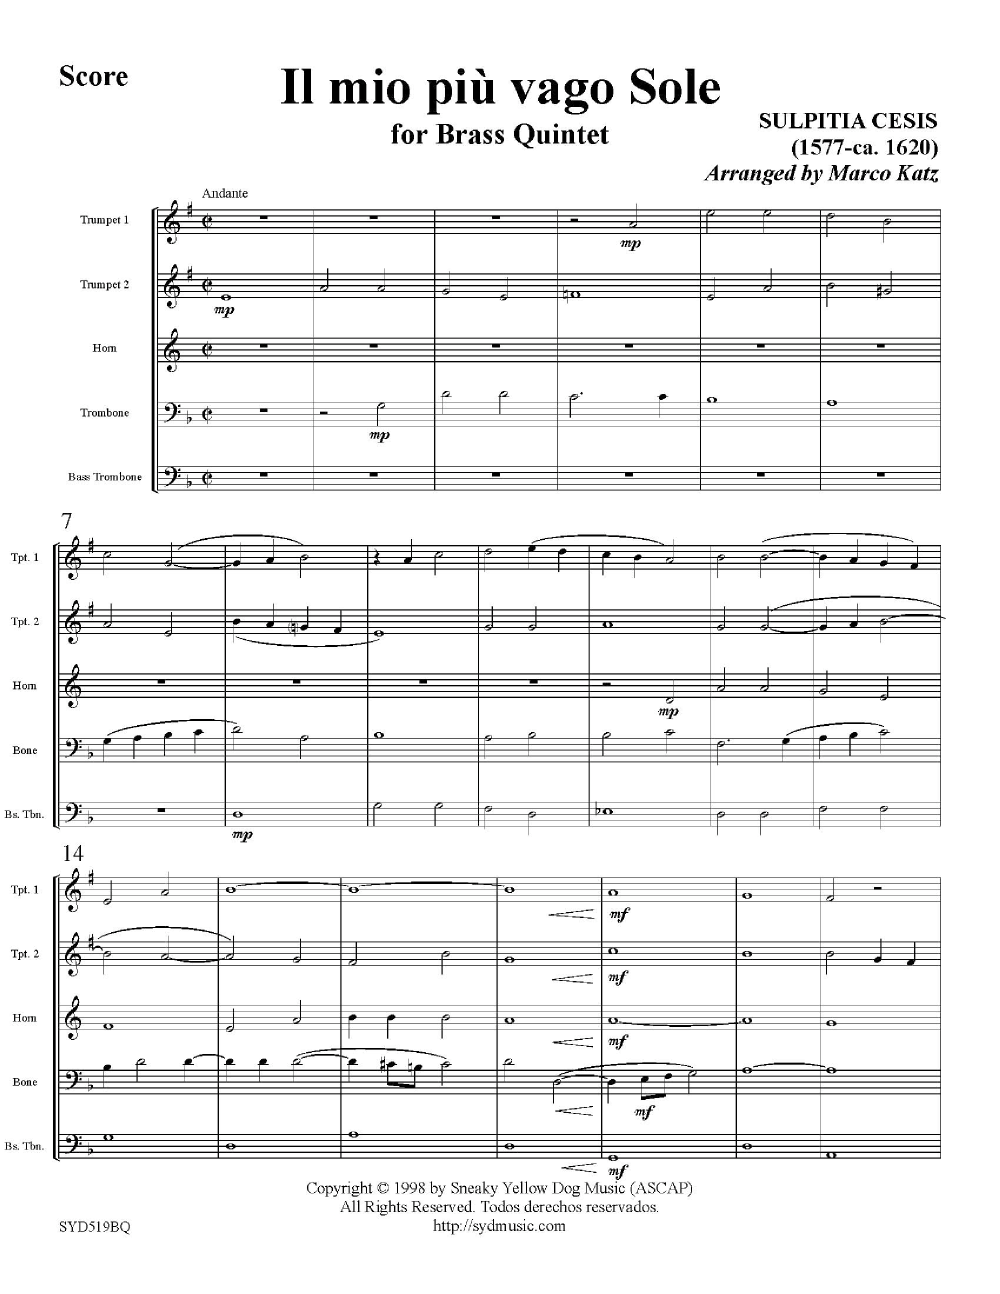 Il Mio Piu Vago Sole-Brass Quintet Thumbnail